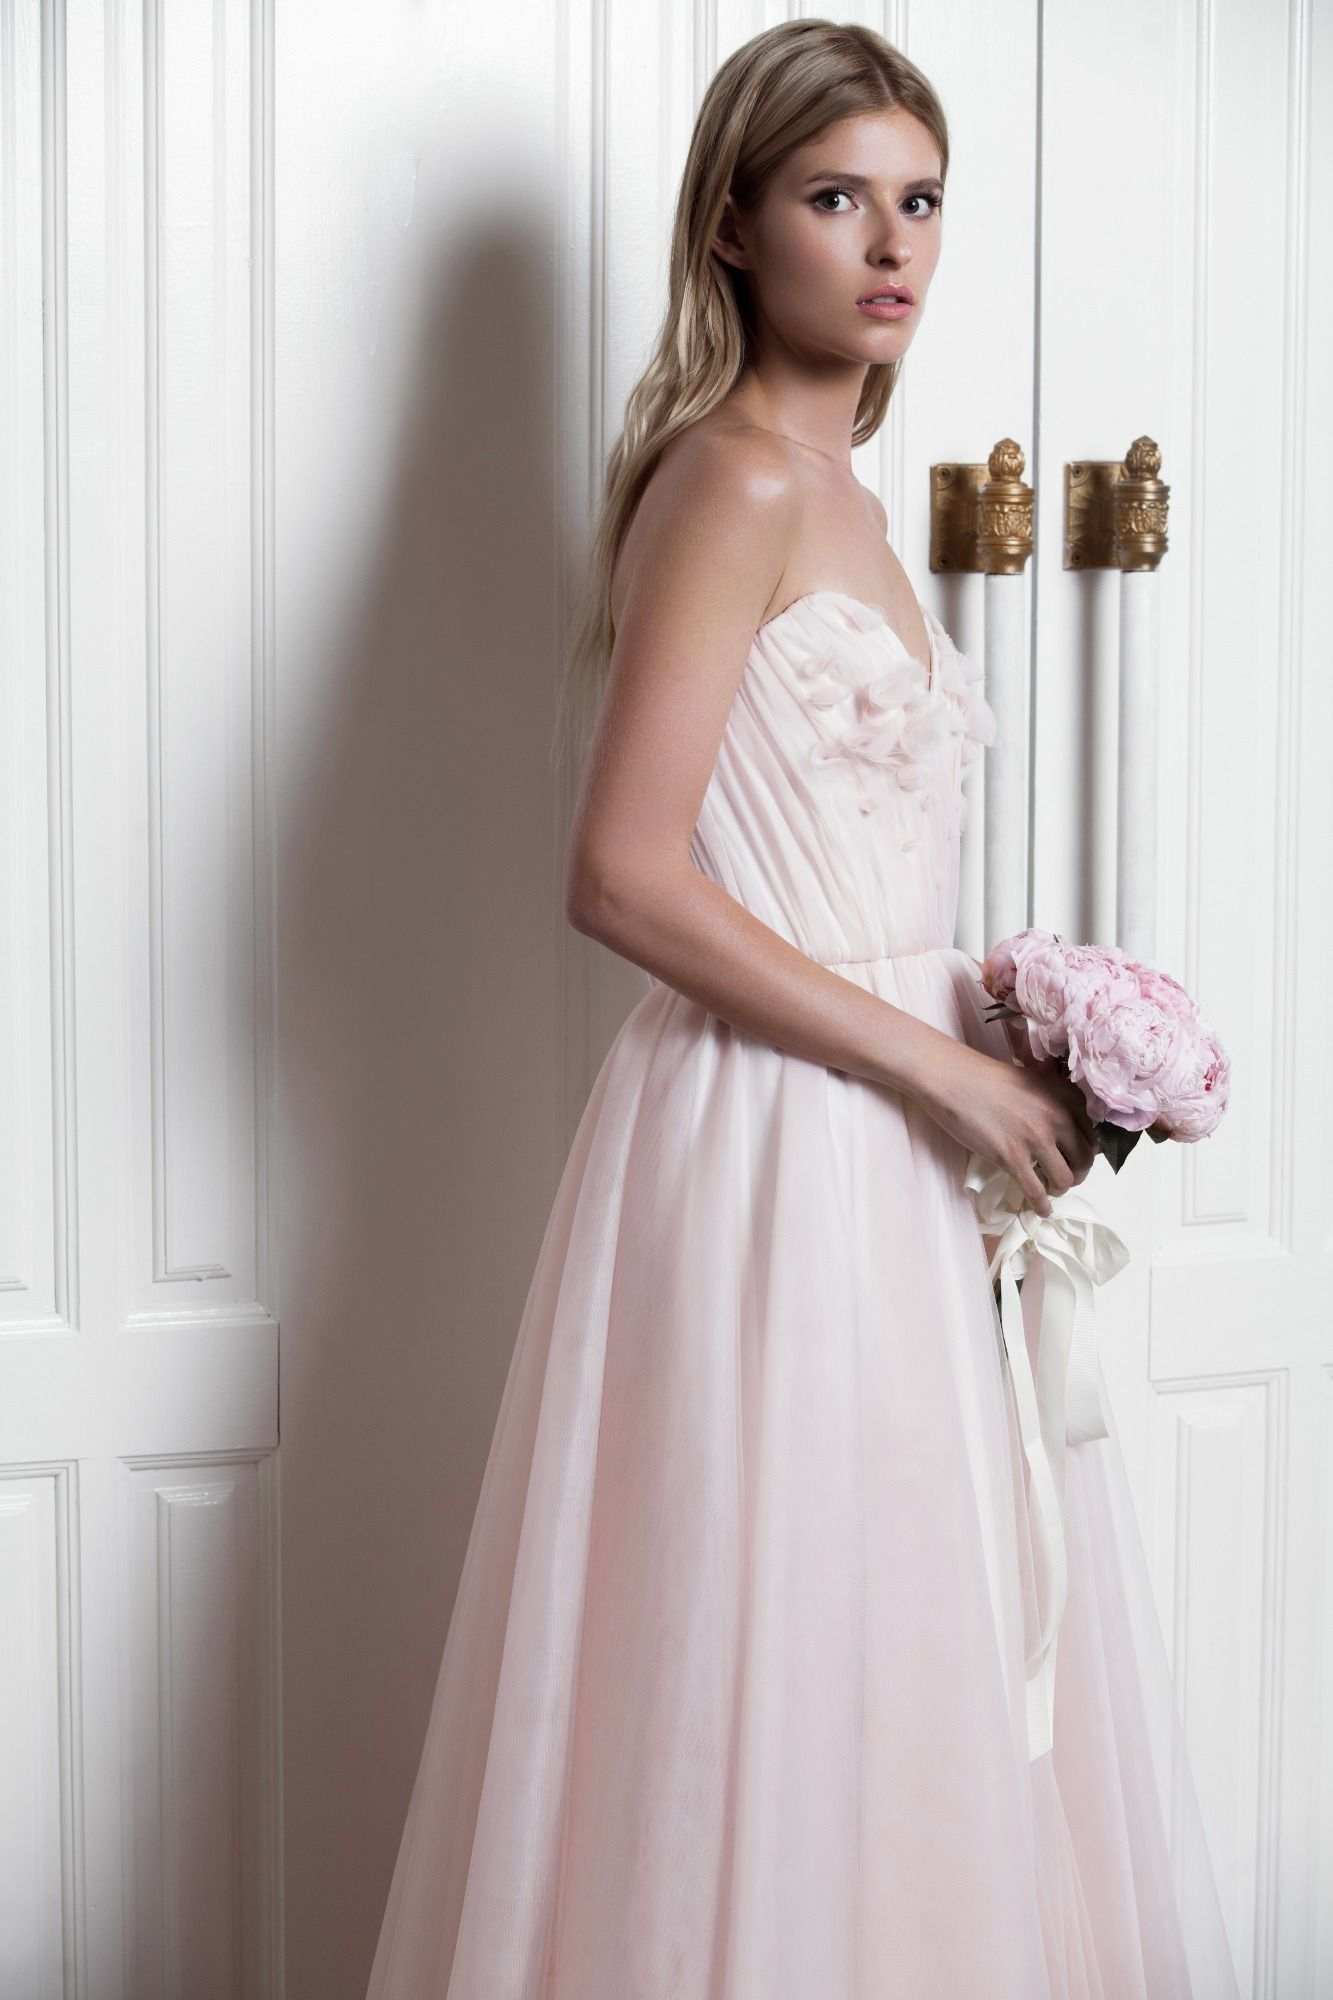 Traditional tunisian wedding dress  Платье Уна Цена u   рублей  Wedding dress  Pinterest